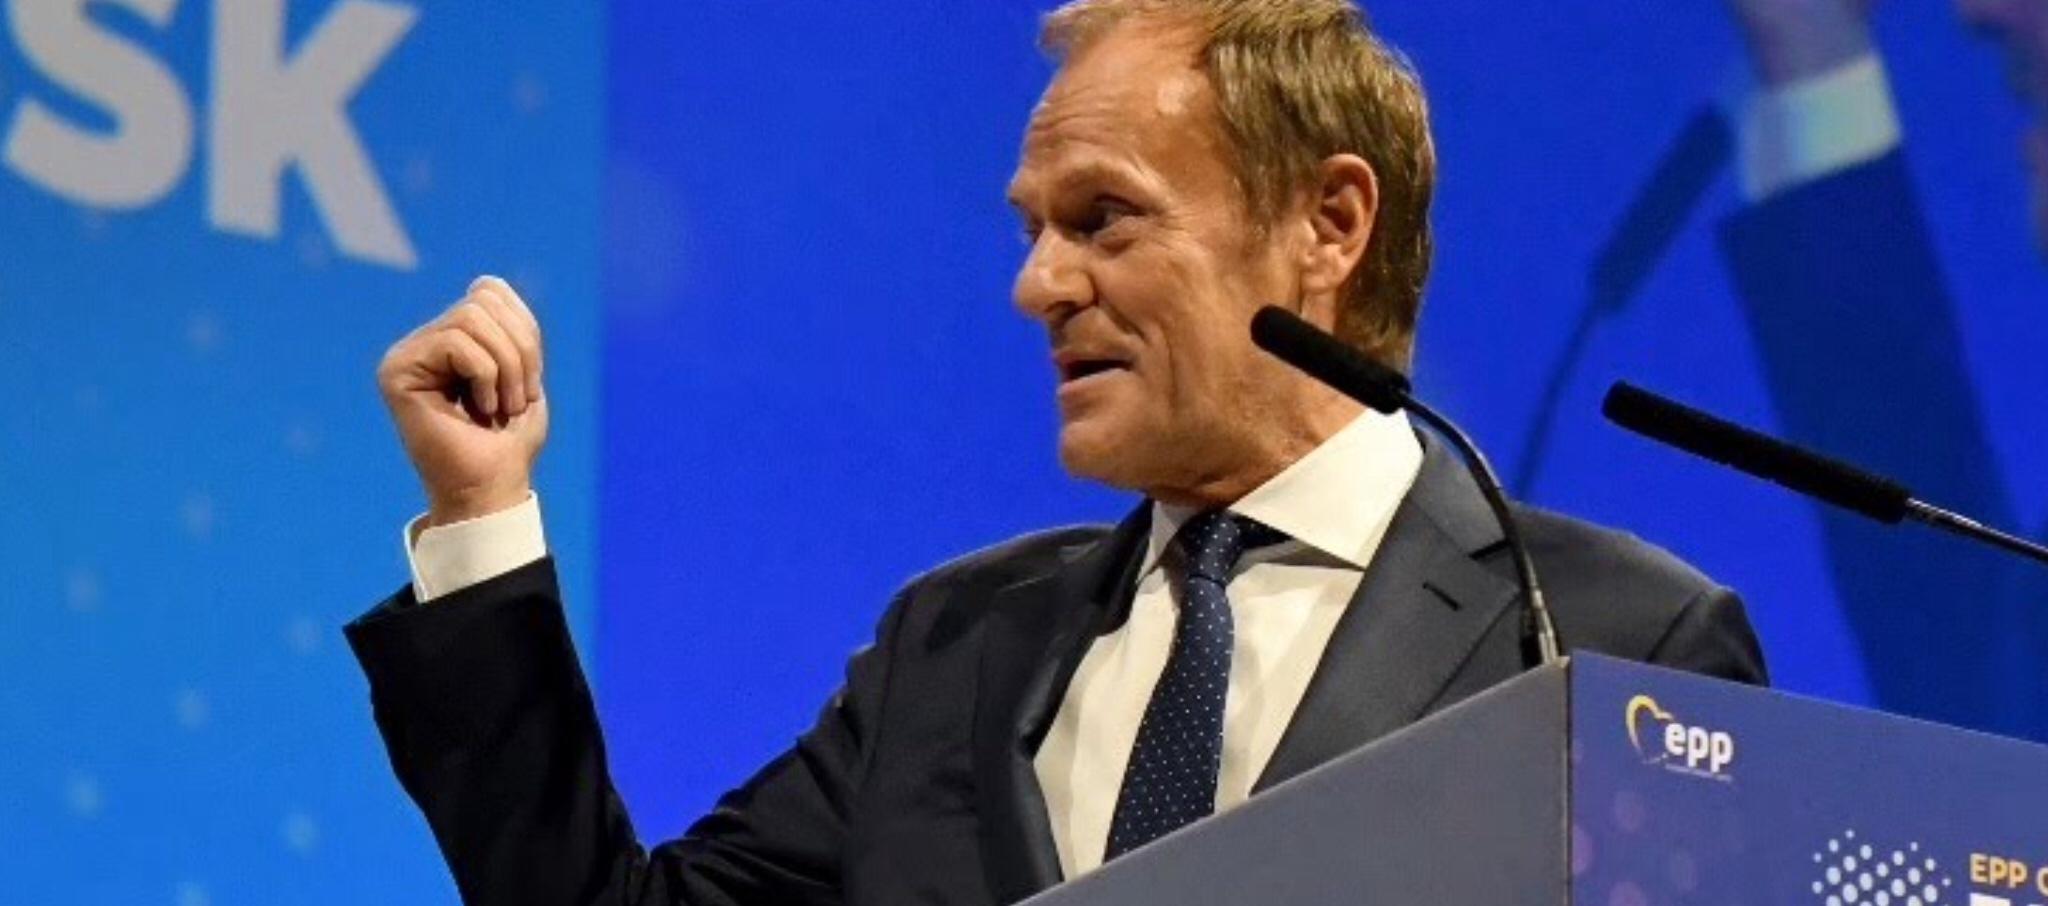 Polish Tusk endorsed for EPP leadership